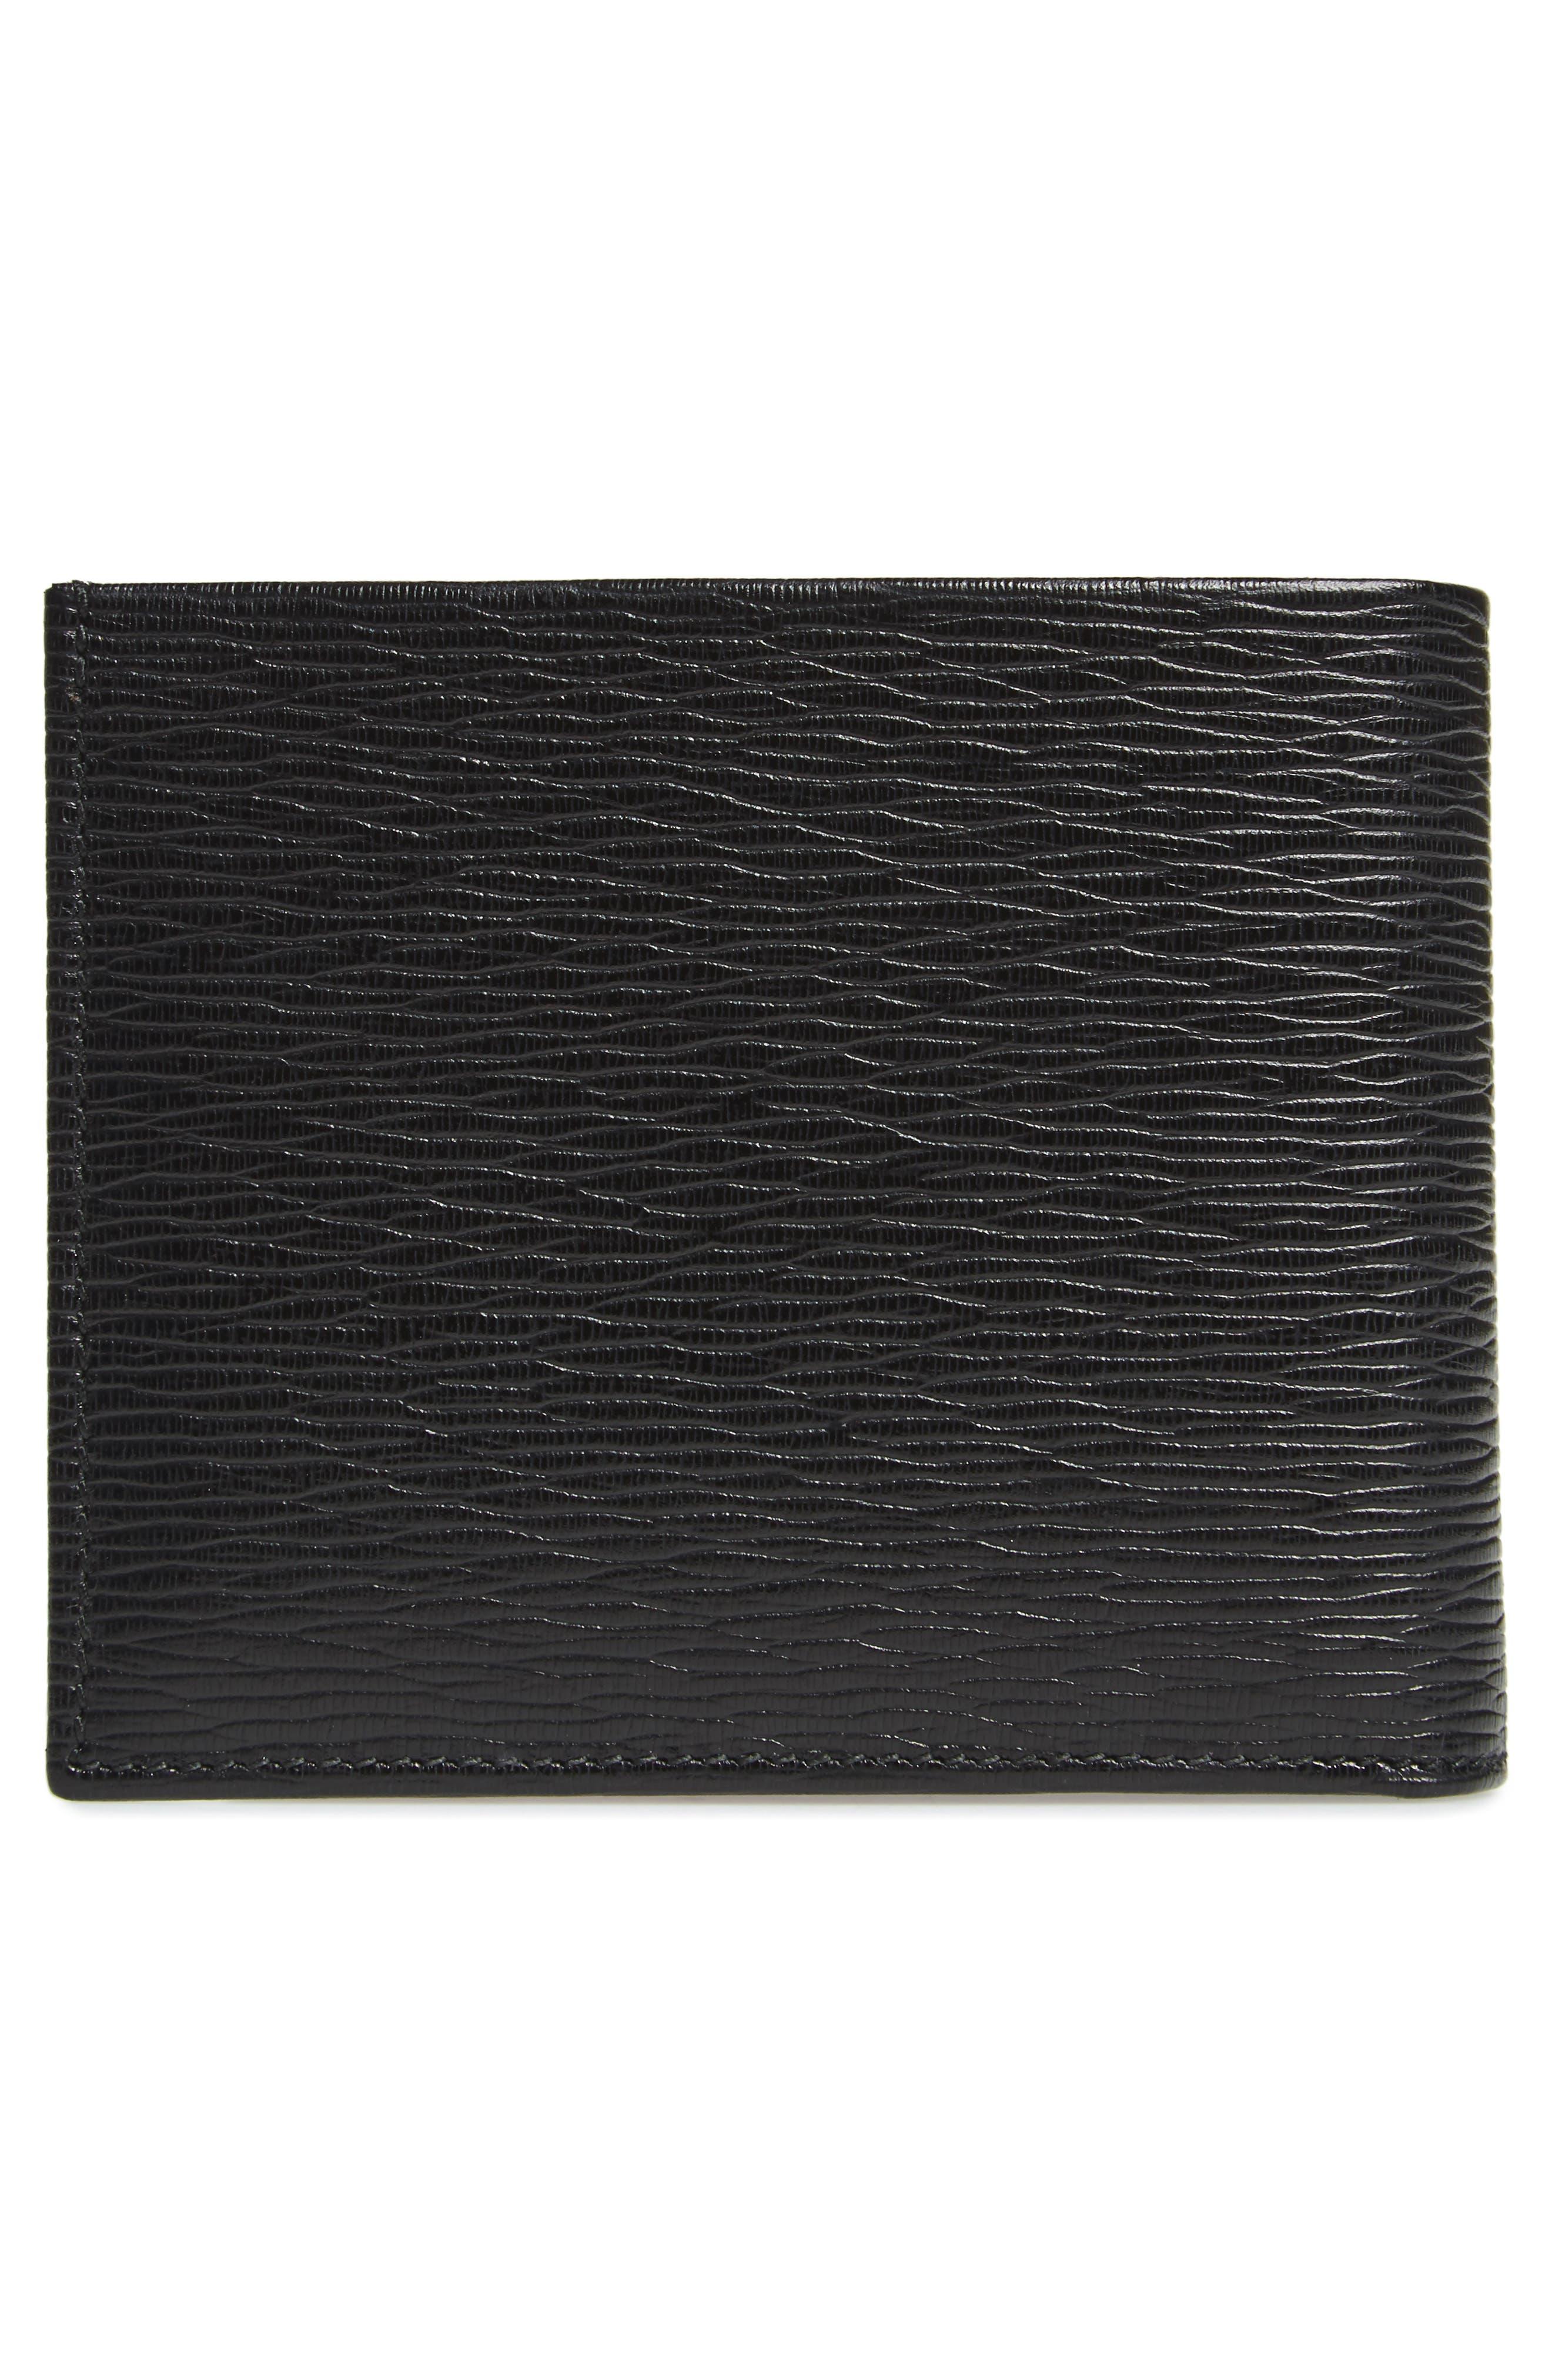 Revival Leather Wallet,                             Alternate thumbnail 3, color,                             009